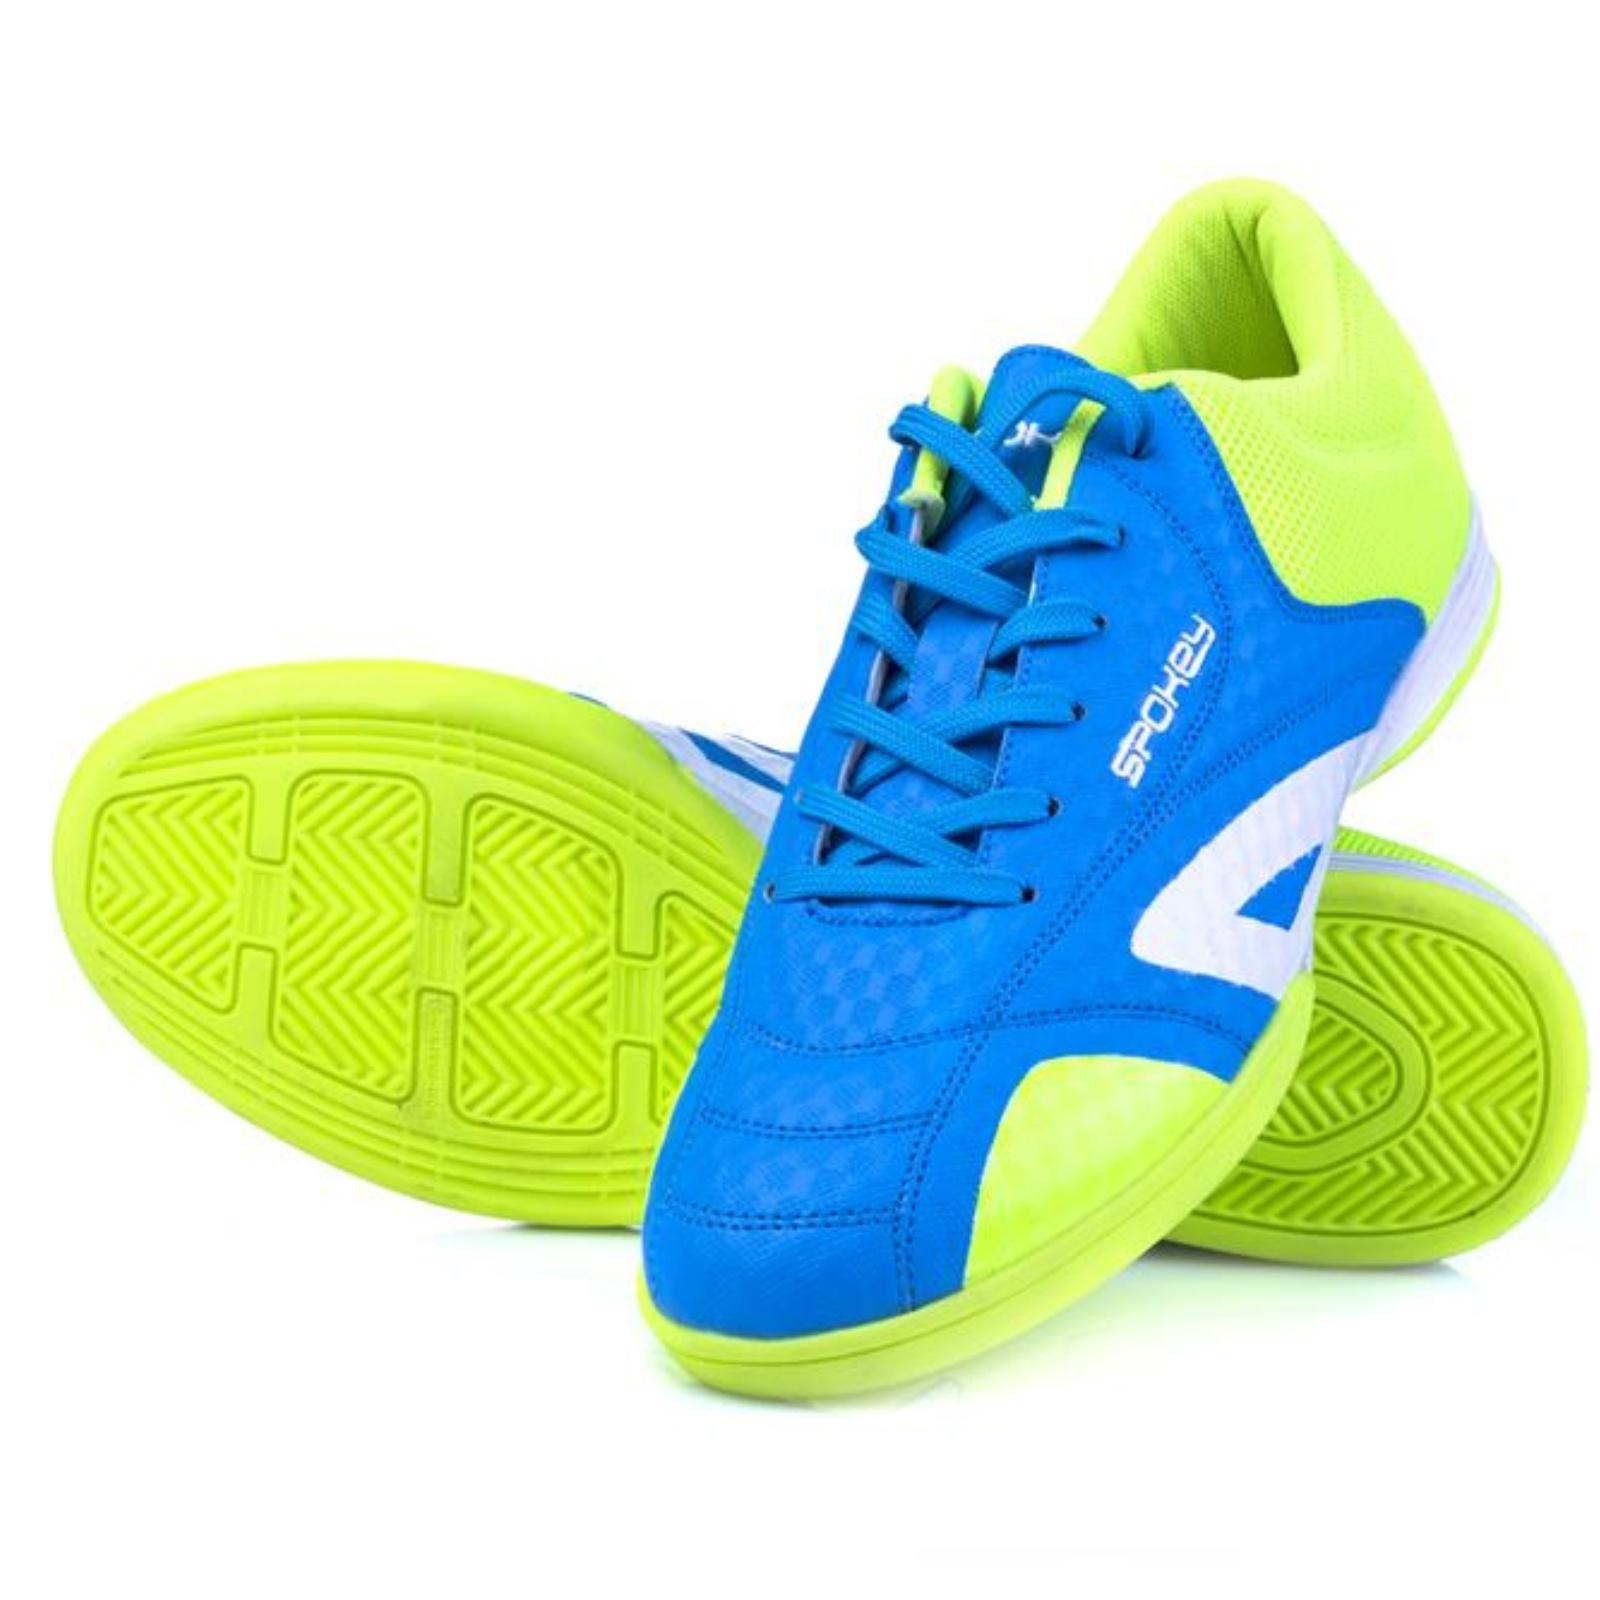 Spokey HALL JR 1 Juniorská halová obuv modro-zelená